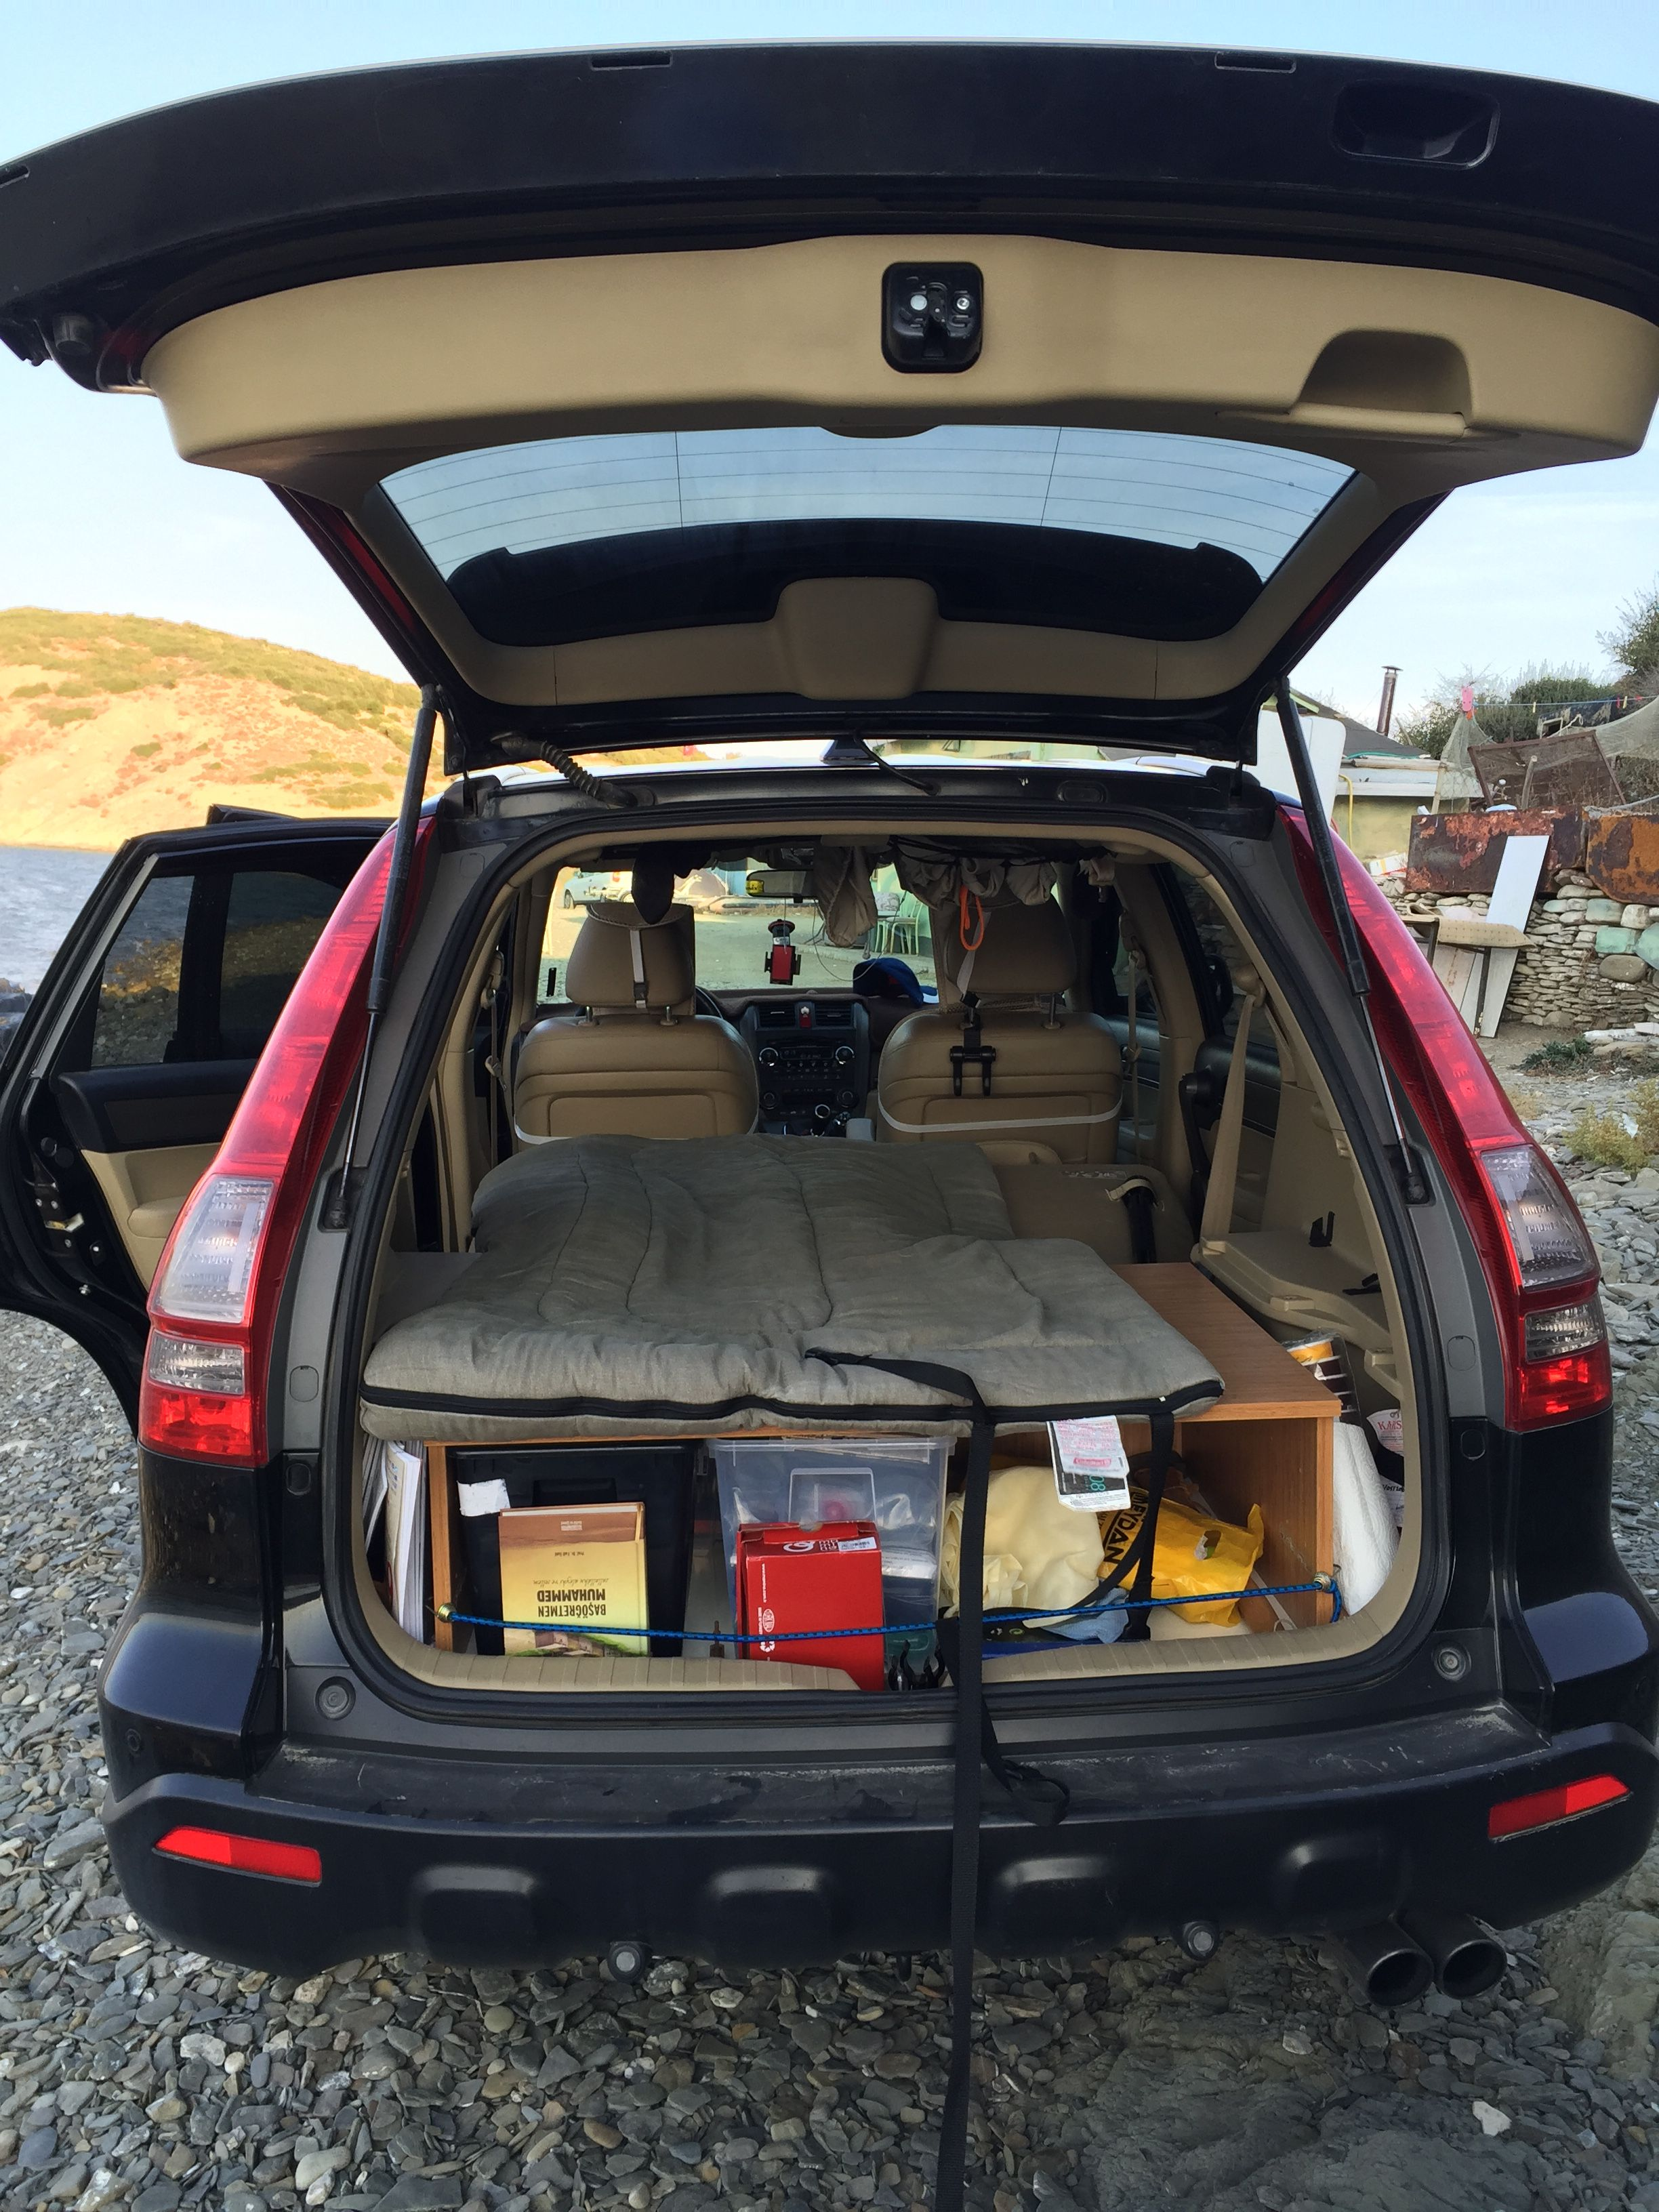 car camping platform camping platform suv camping suv camper minivan camping. Black Bedroom Furniture Sets. Home Design Ideas